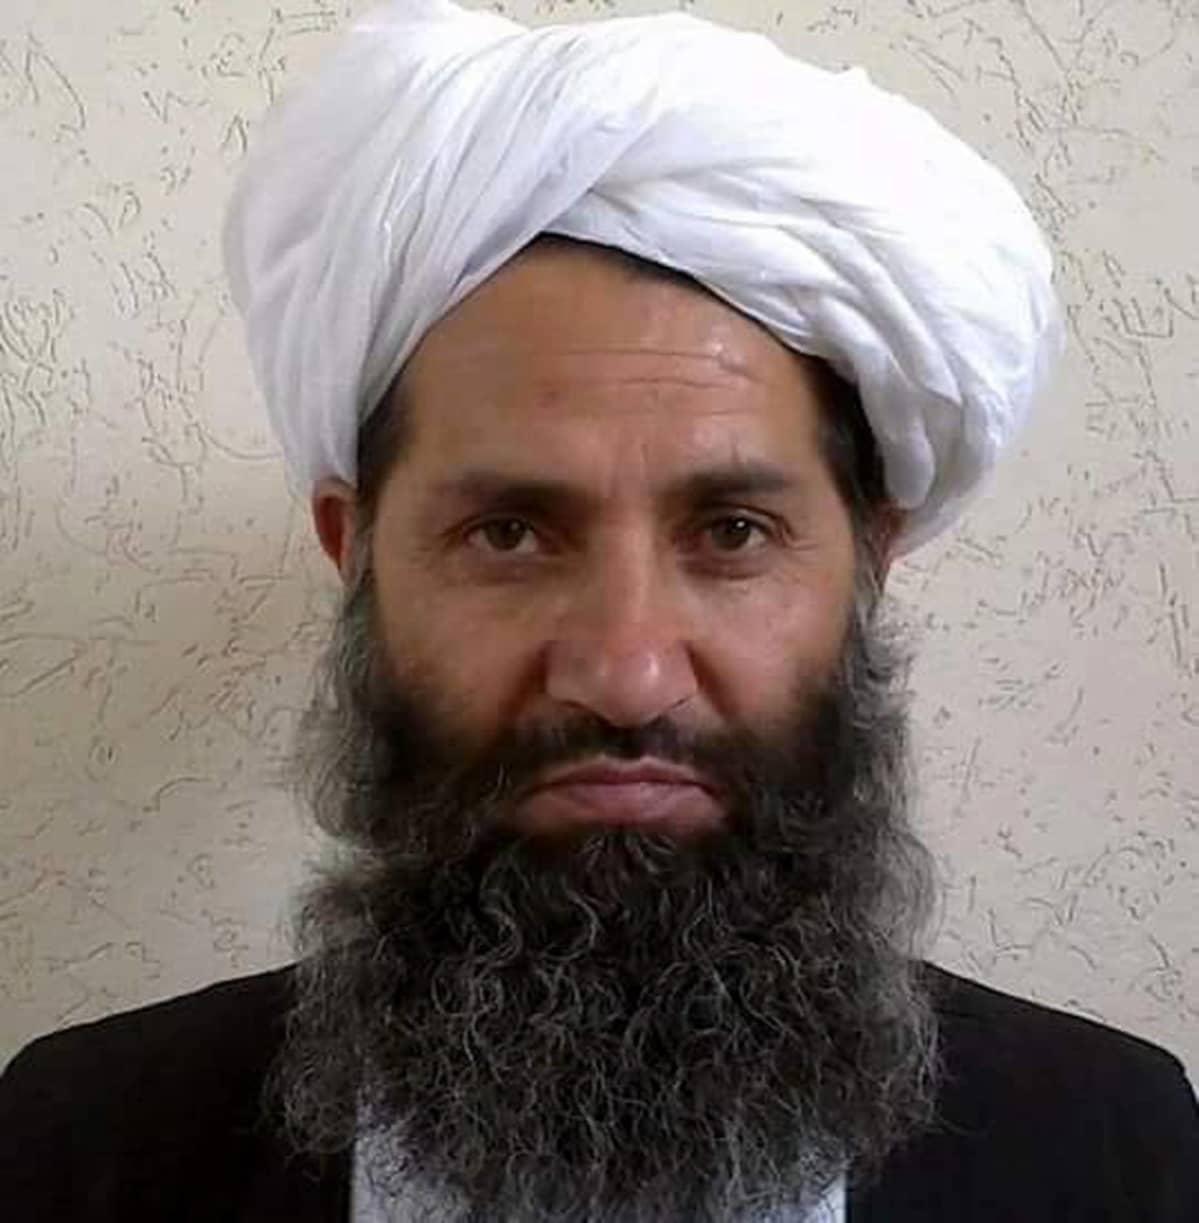 Talibanin korkein johtaja Mawlawi Hibatullah Akhundzada kuvattuna vuonna 2016.